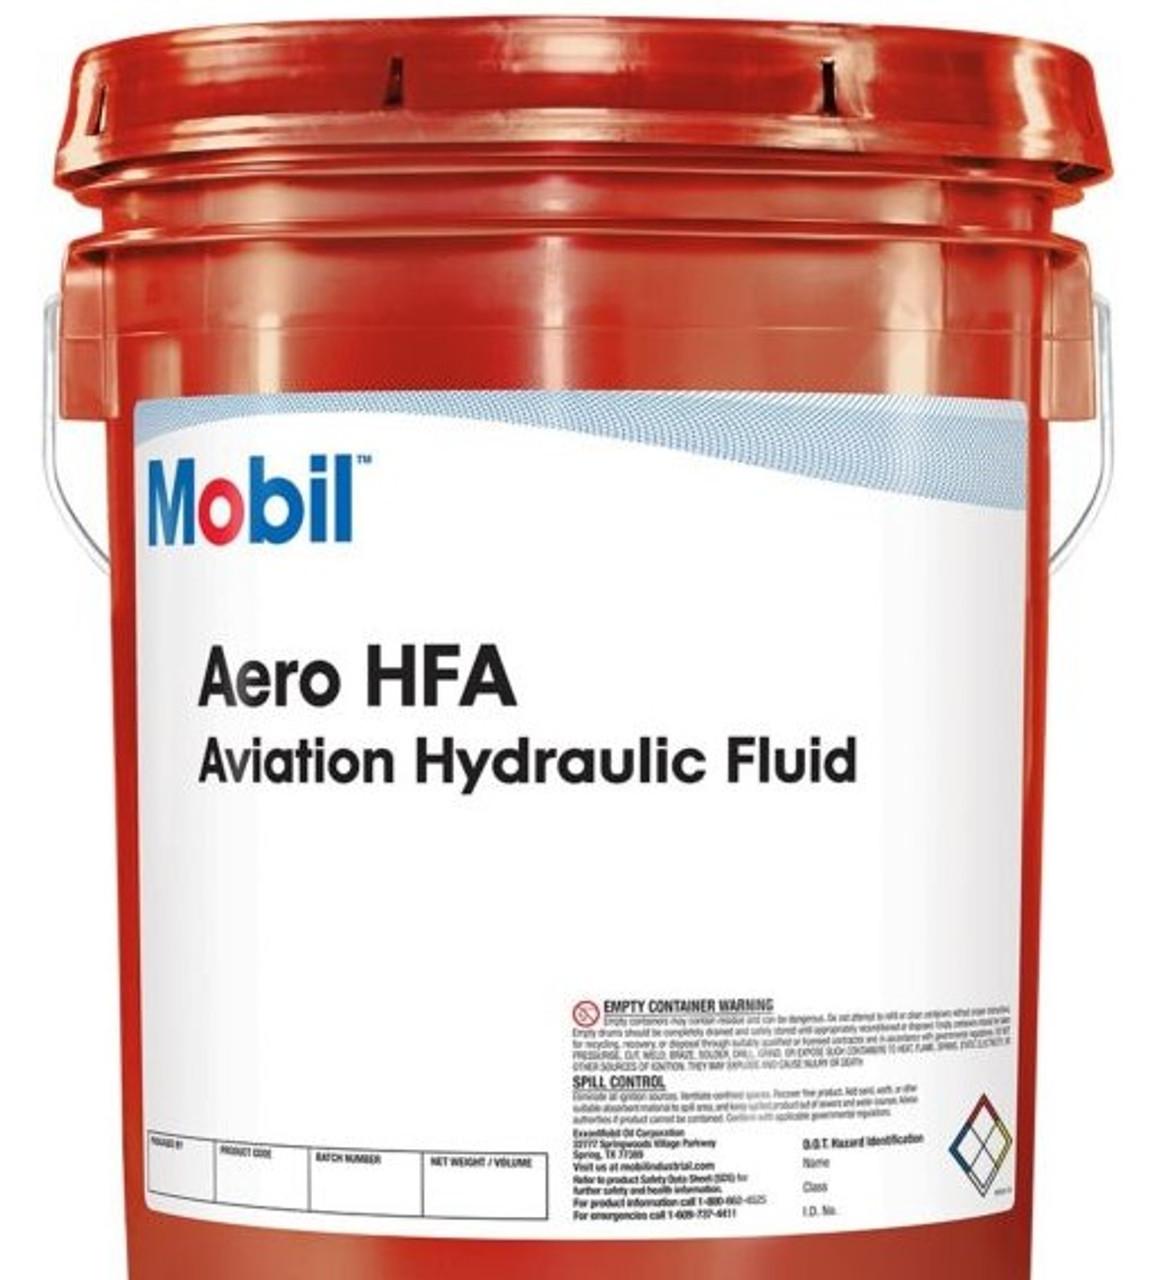 MOBIL AERO HFA - 5 GALLON PAIL